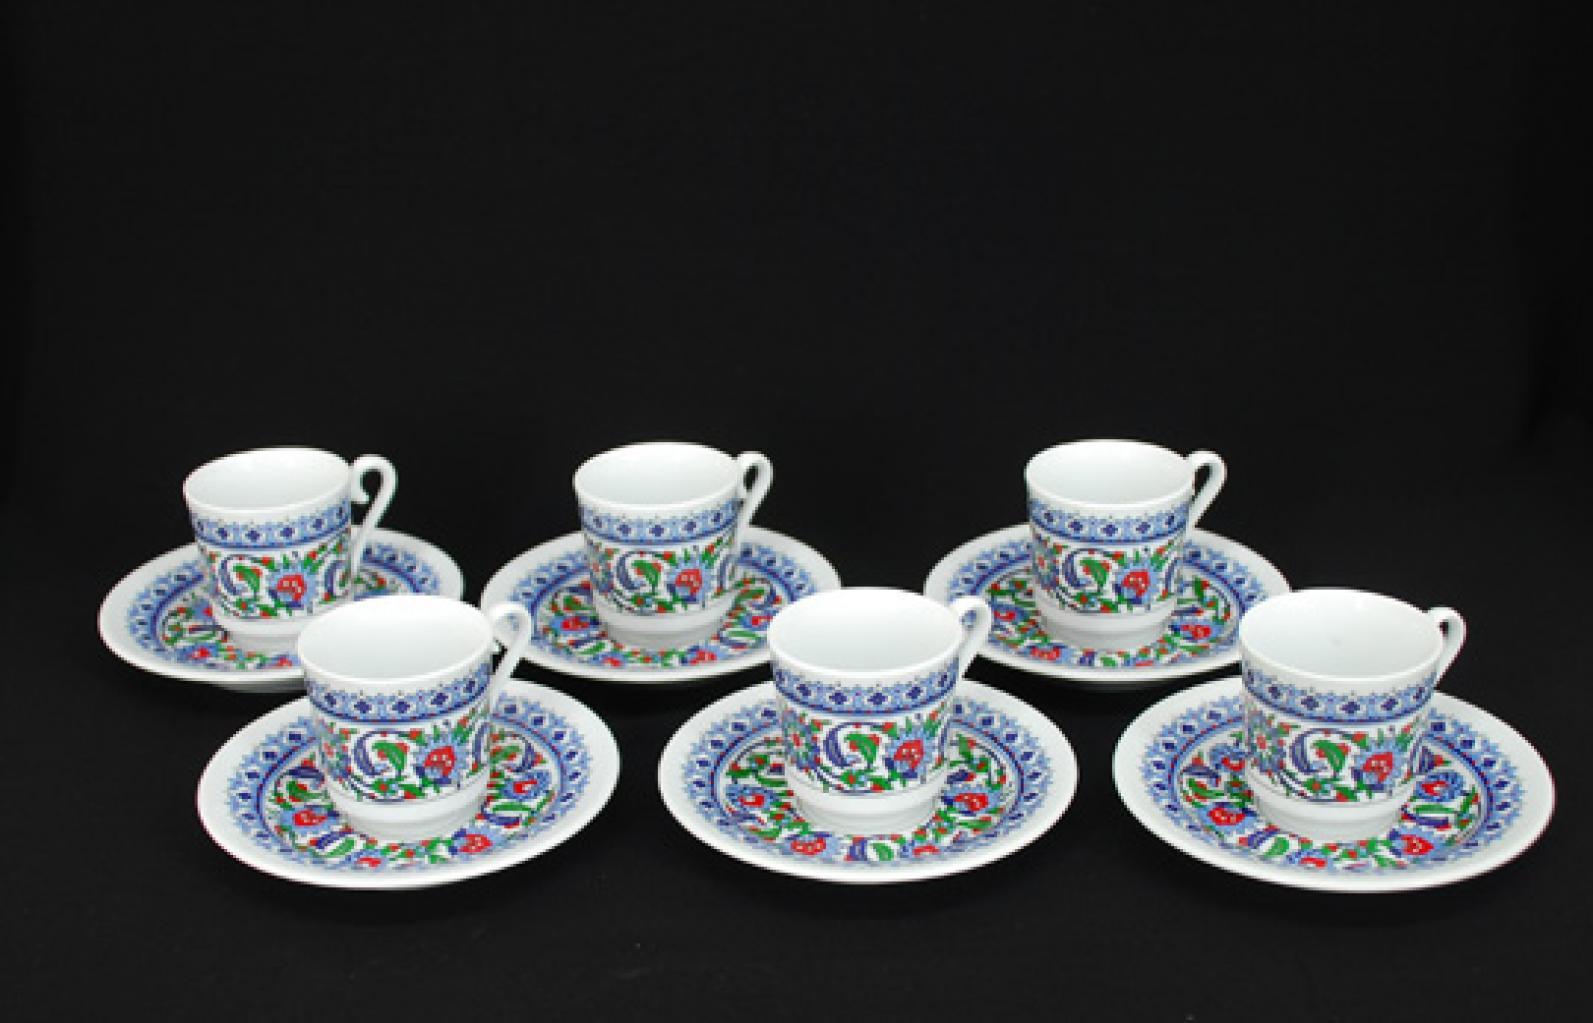 Premium Quality  Arabian Demitasse Coffee Cups gi575